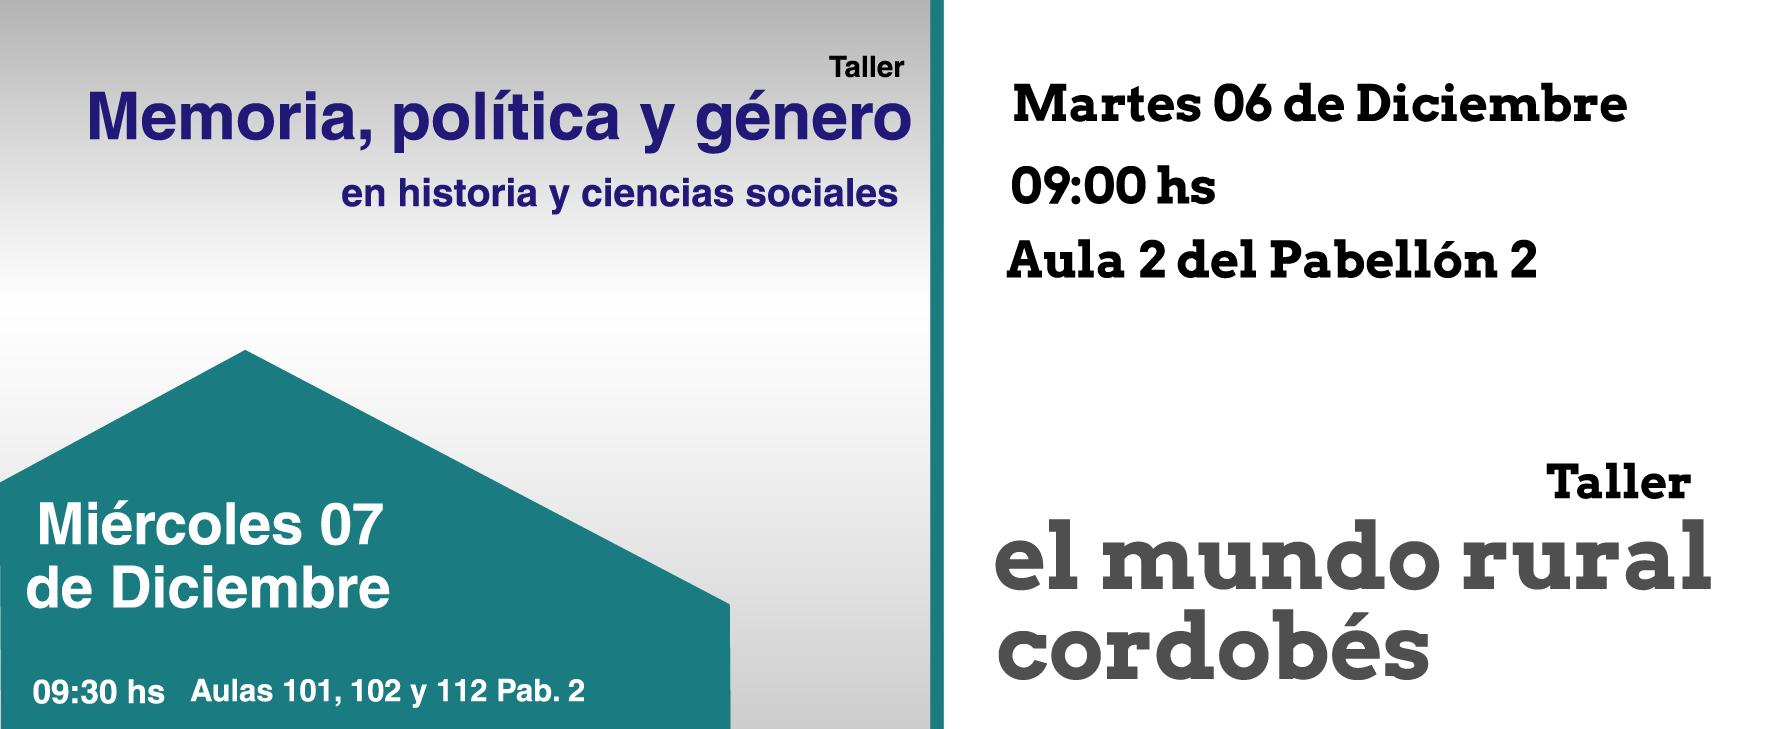 TALLERES-01-01